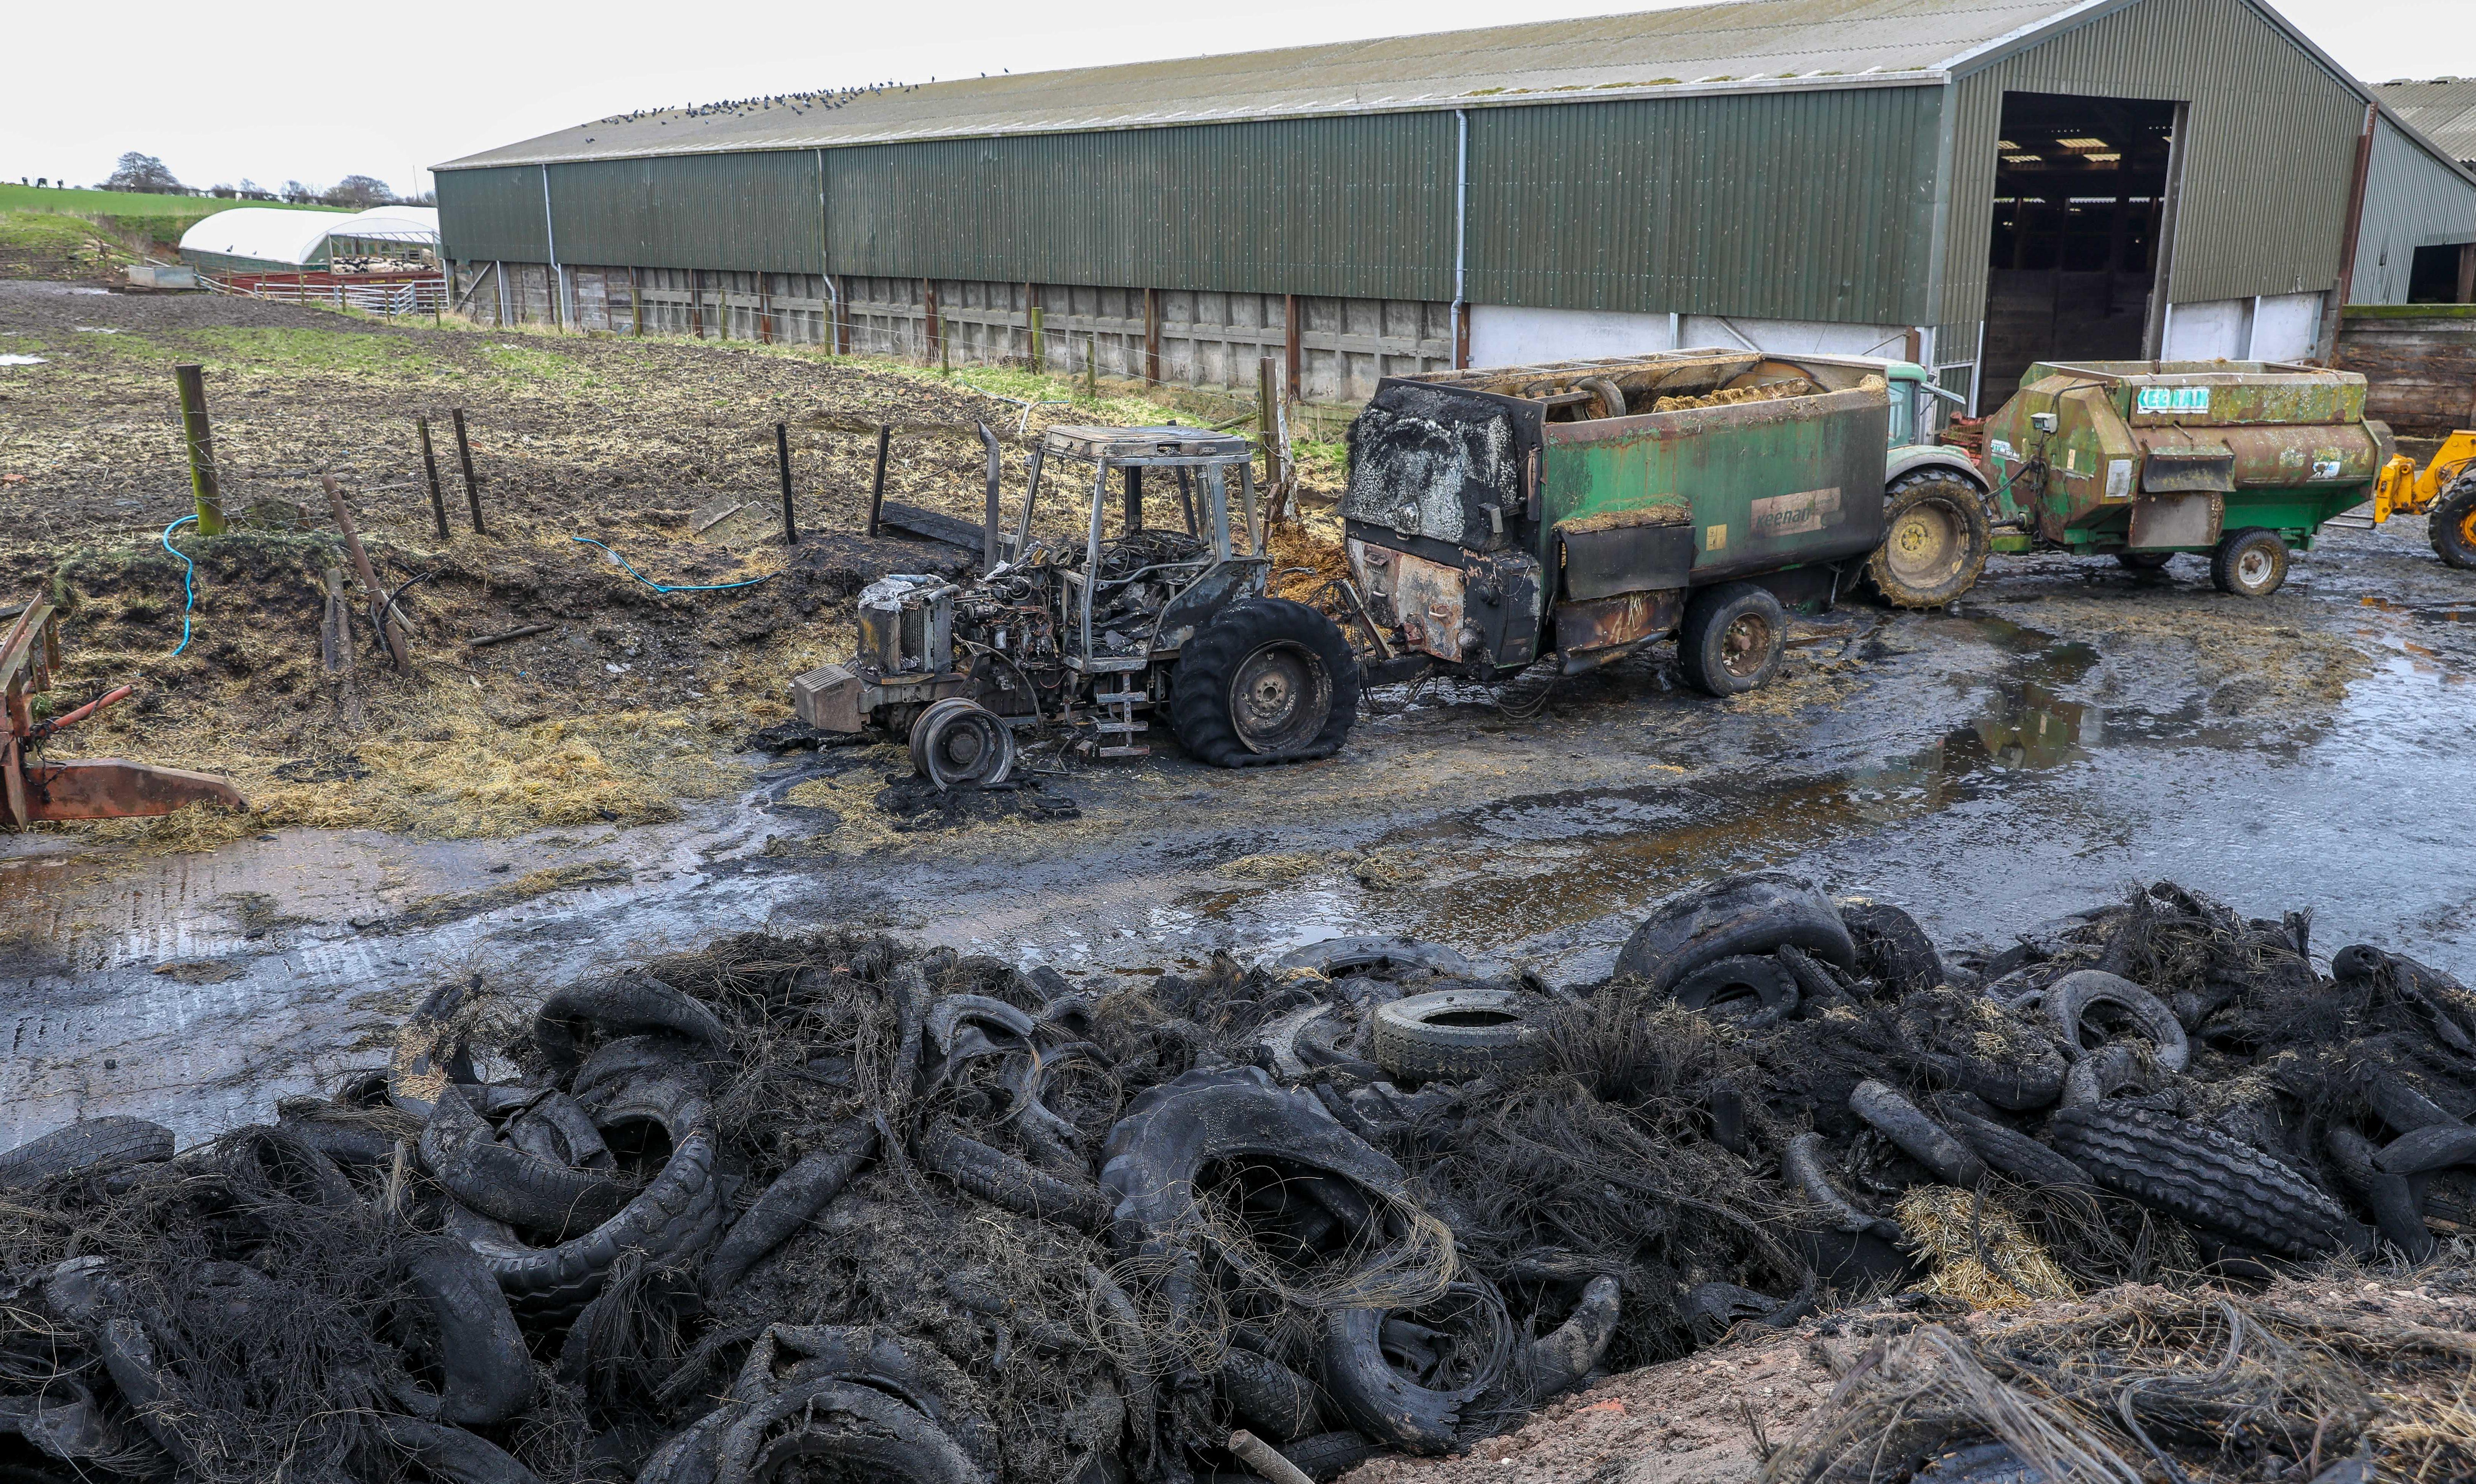 Bankhead Farm Fire aftermath